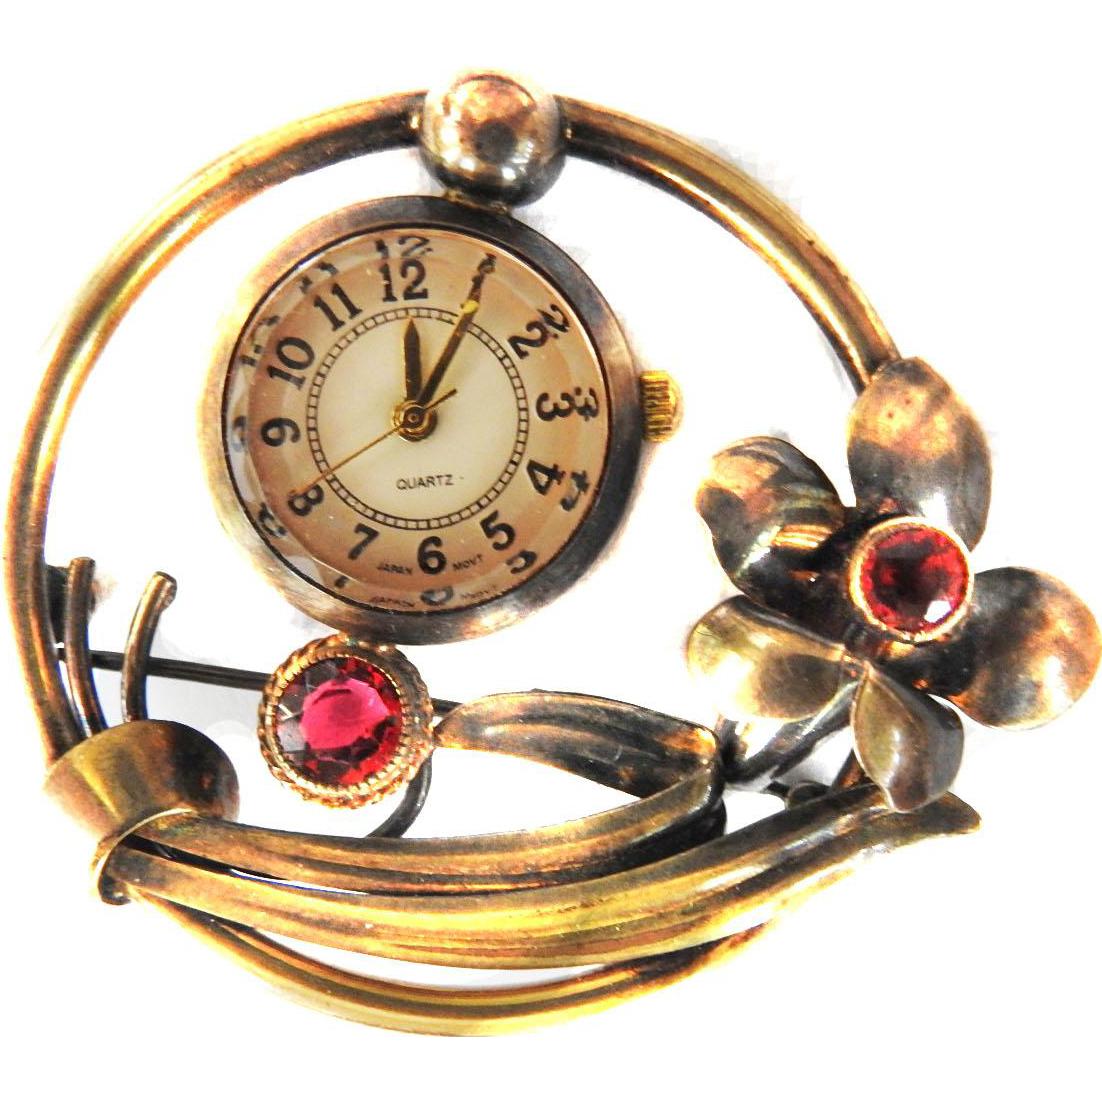 Exquisite Quartz Rhinestone Brooch Watch Deco Style 1930s